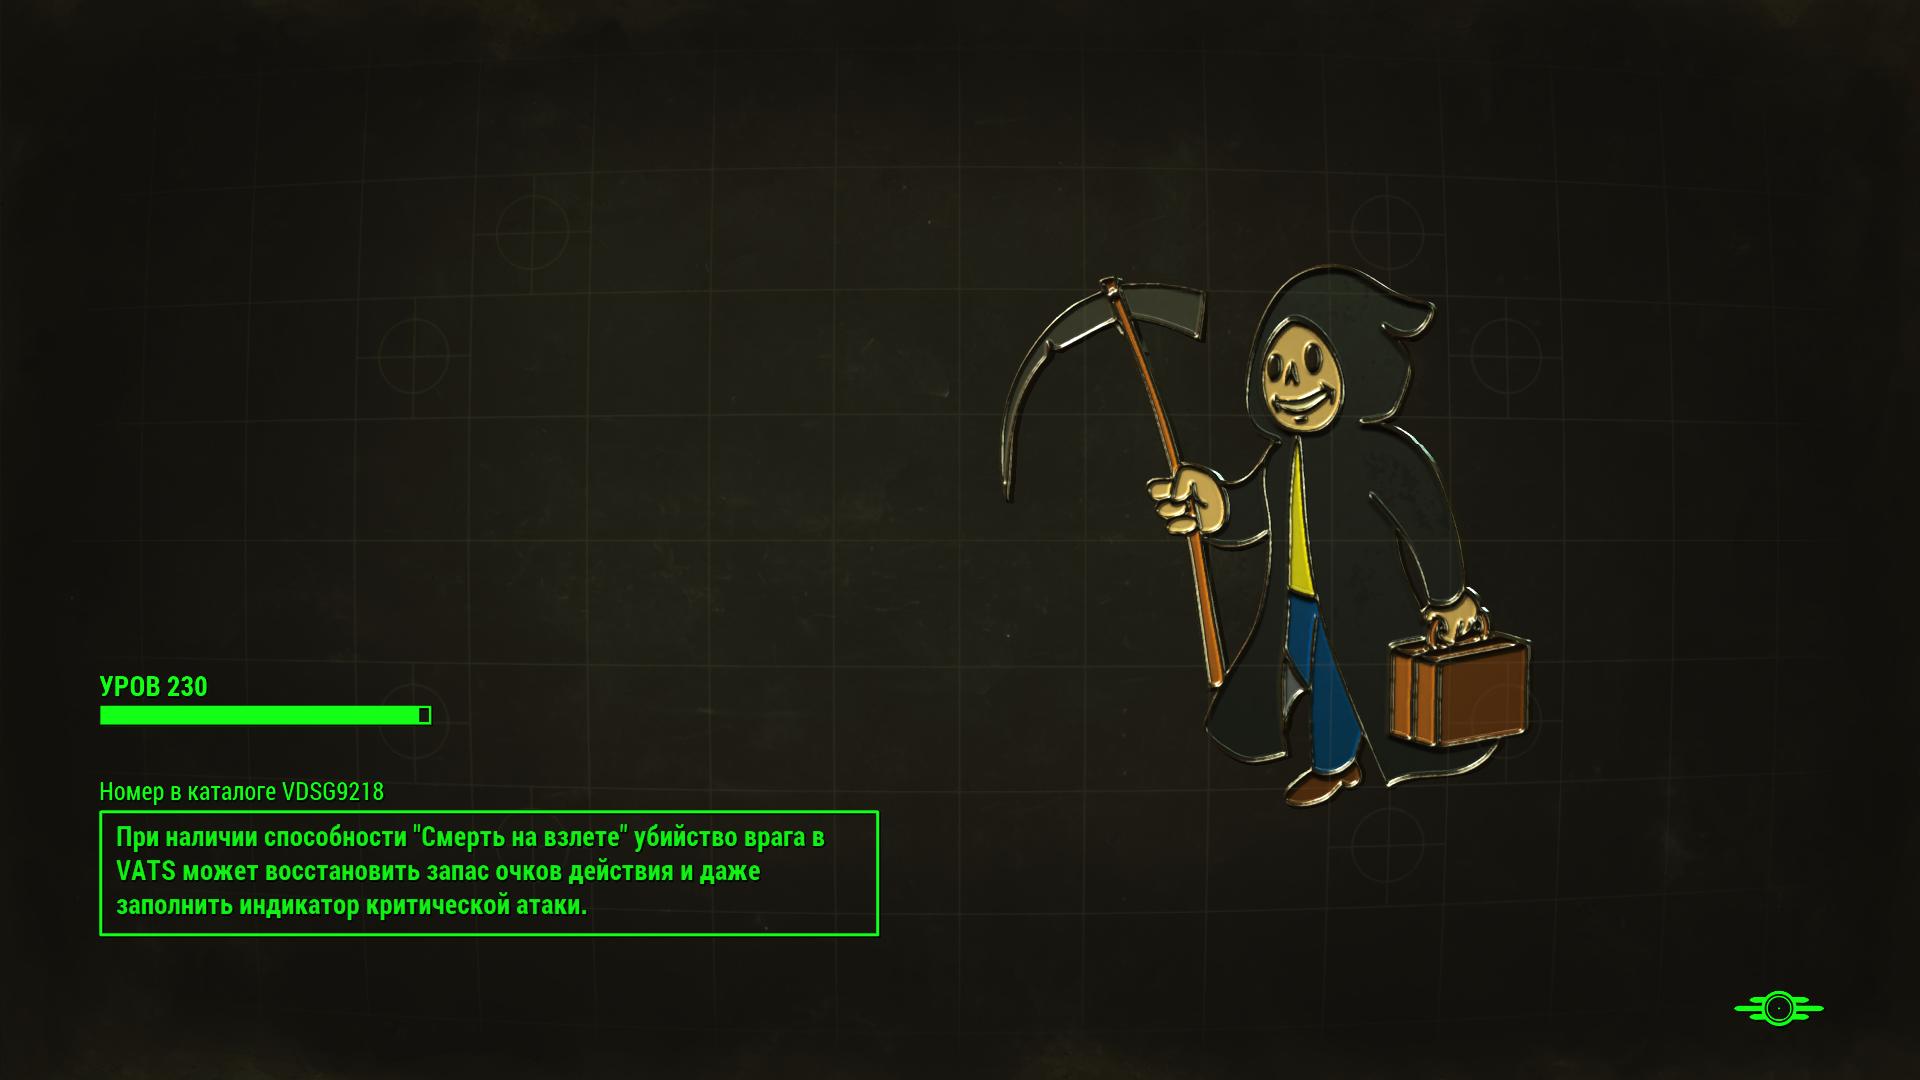 Смерть на взлёте (Fallout 4)